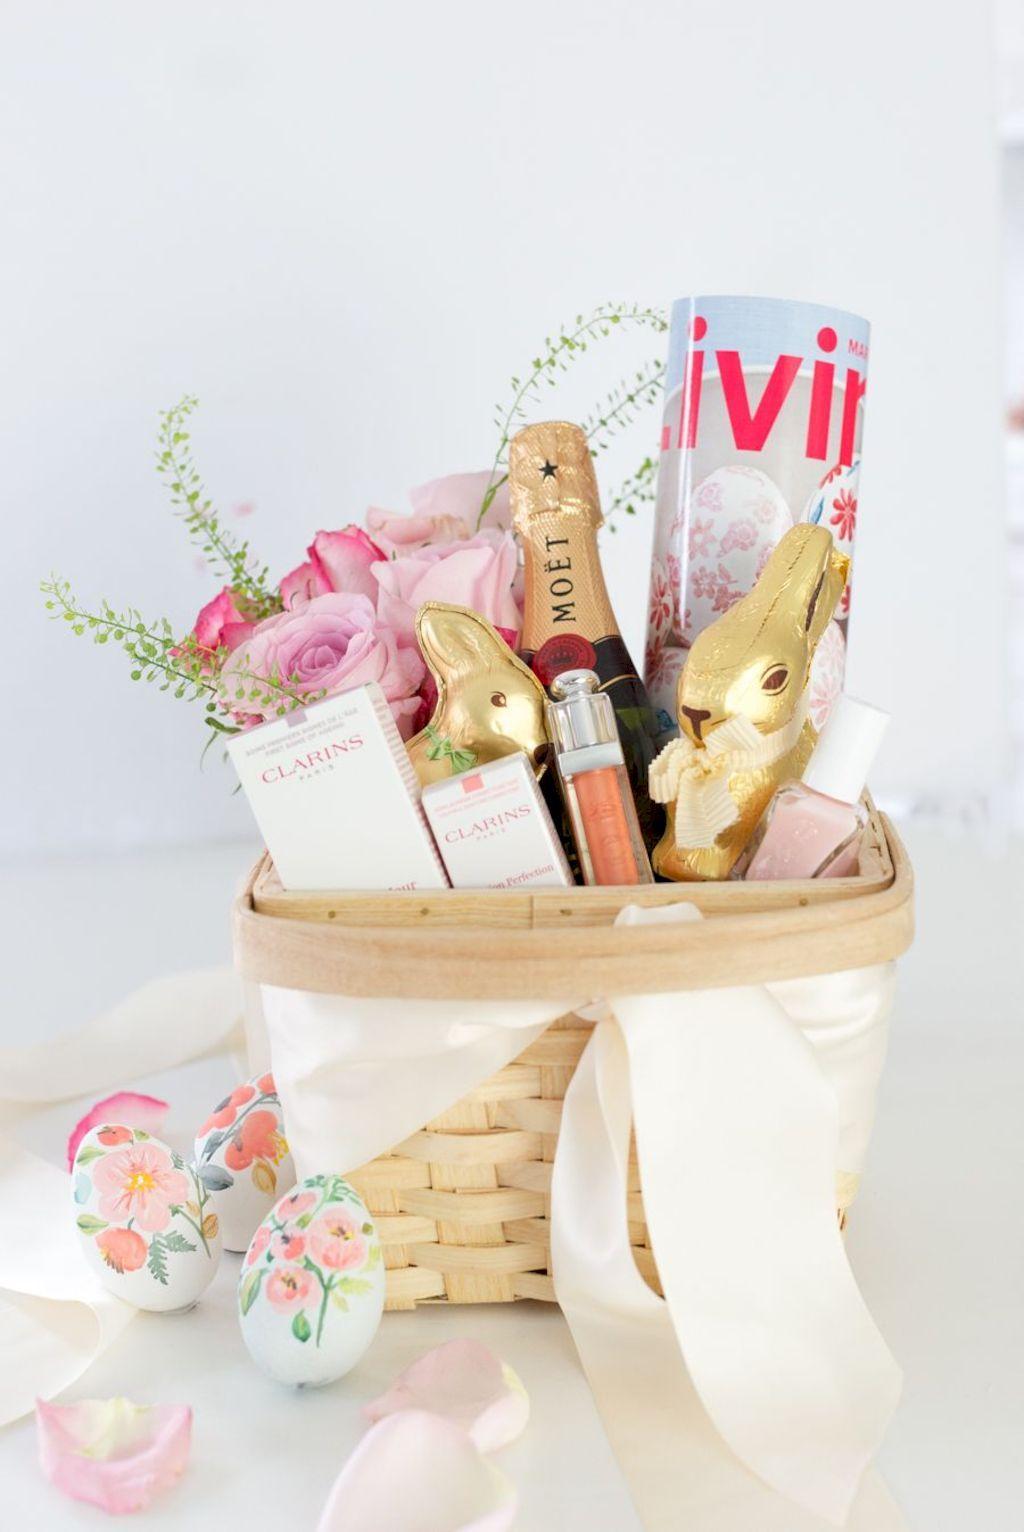 45 Homemade Easter Basket Ideas And Gift Ornaments Shairoom Com Homemade Easter Baskets Easter Basket Diy Easter Diy